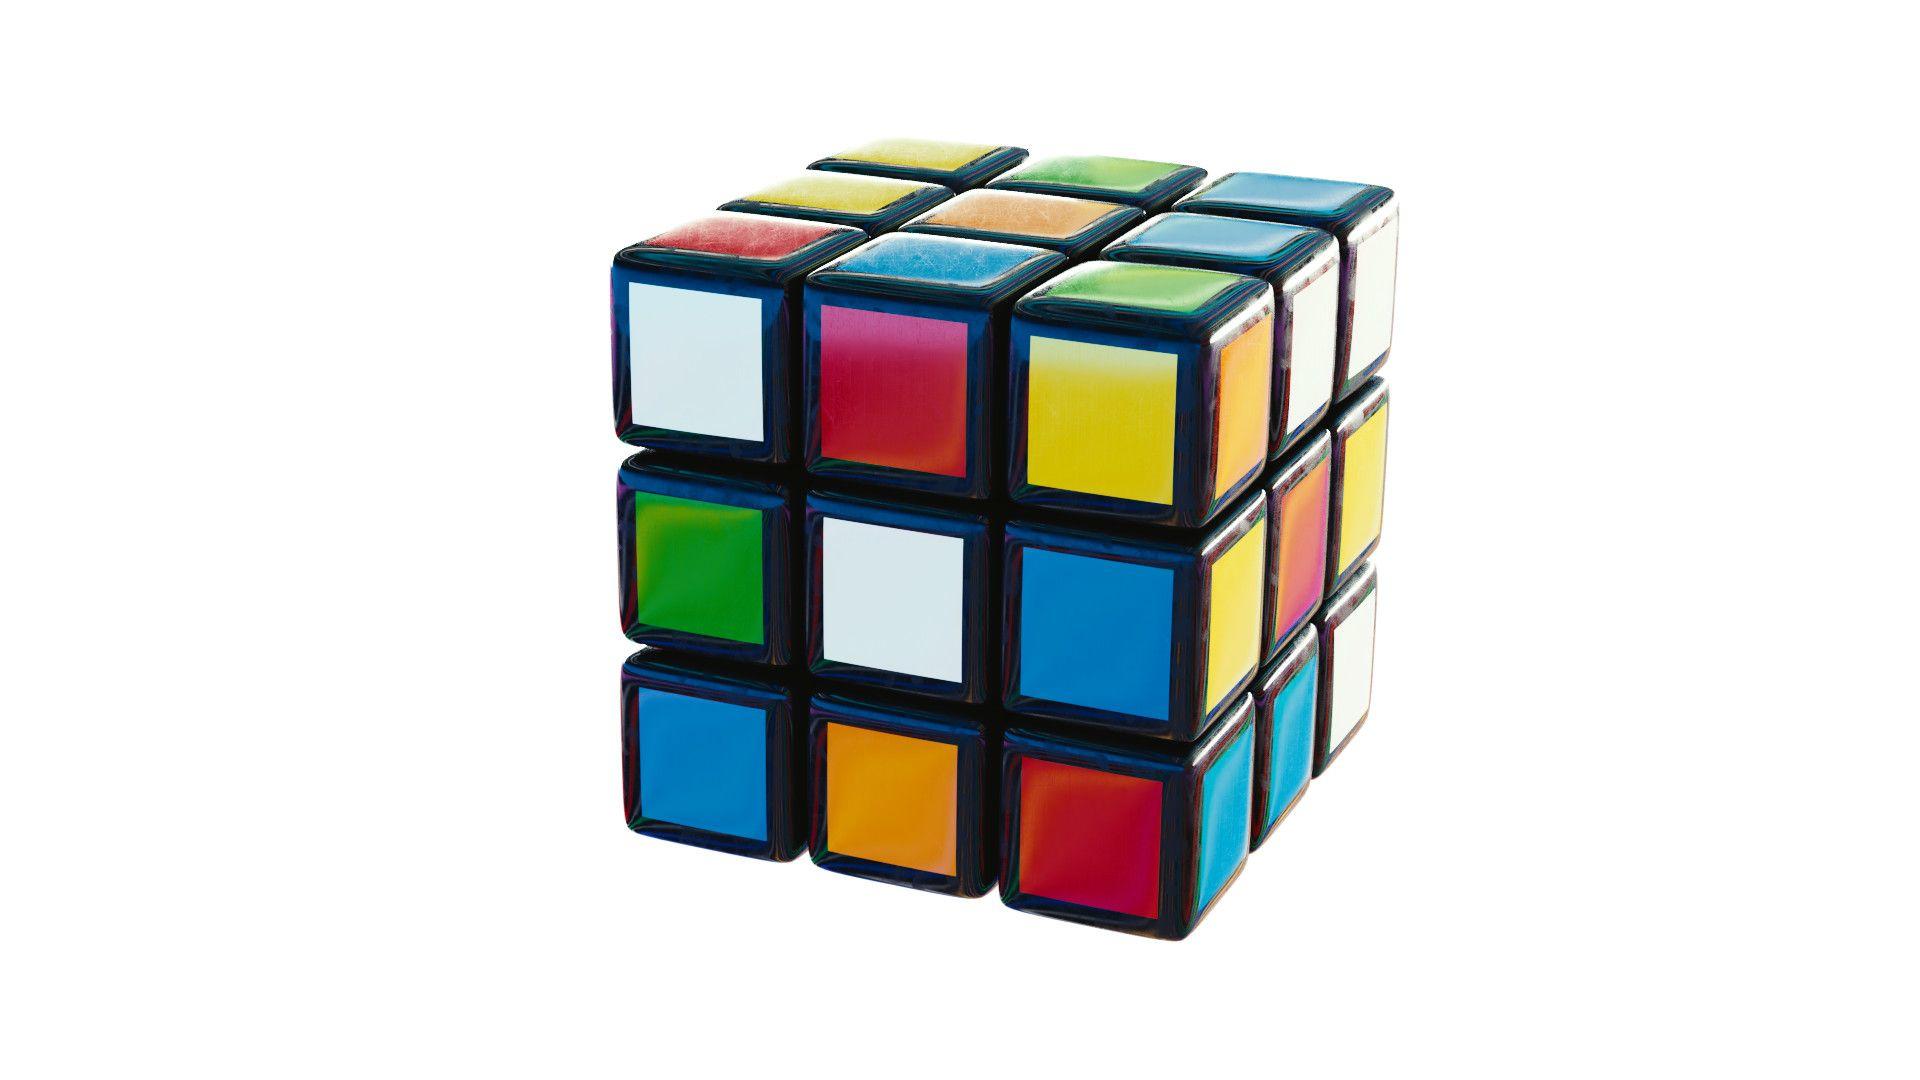 Rubiks Cube wallpaper image